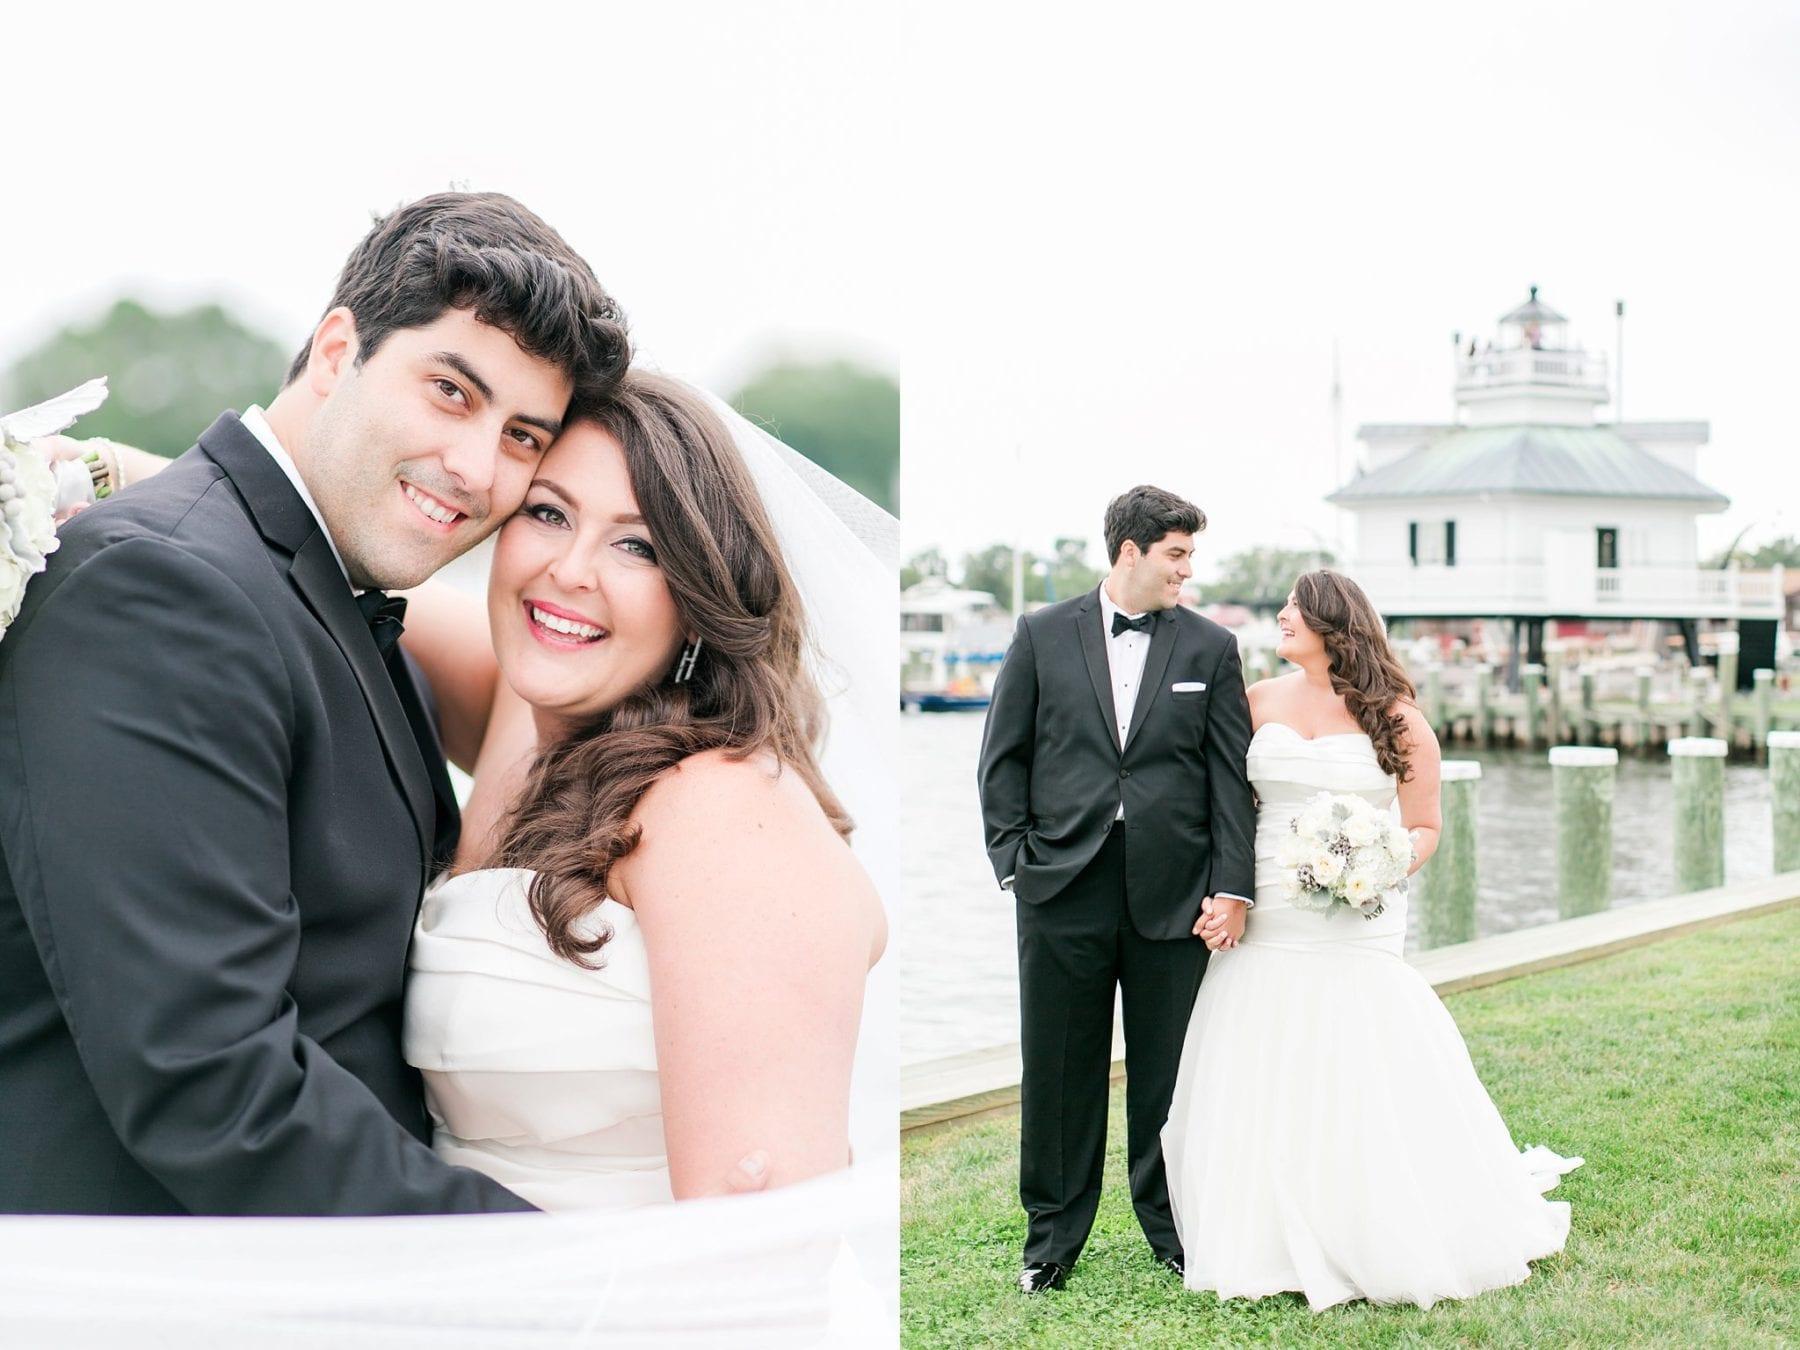 Chesapeake Bay Maritime Museum Wedding Photos Maryland Wedding Photographer Megan Kelsey Photography Halie & Mike-61.jpg